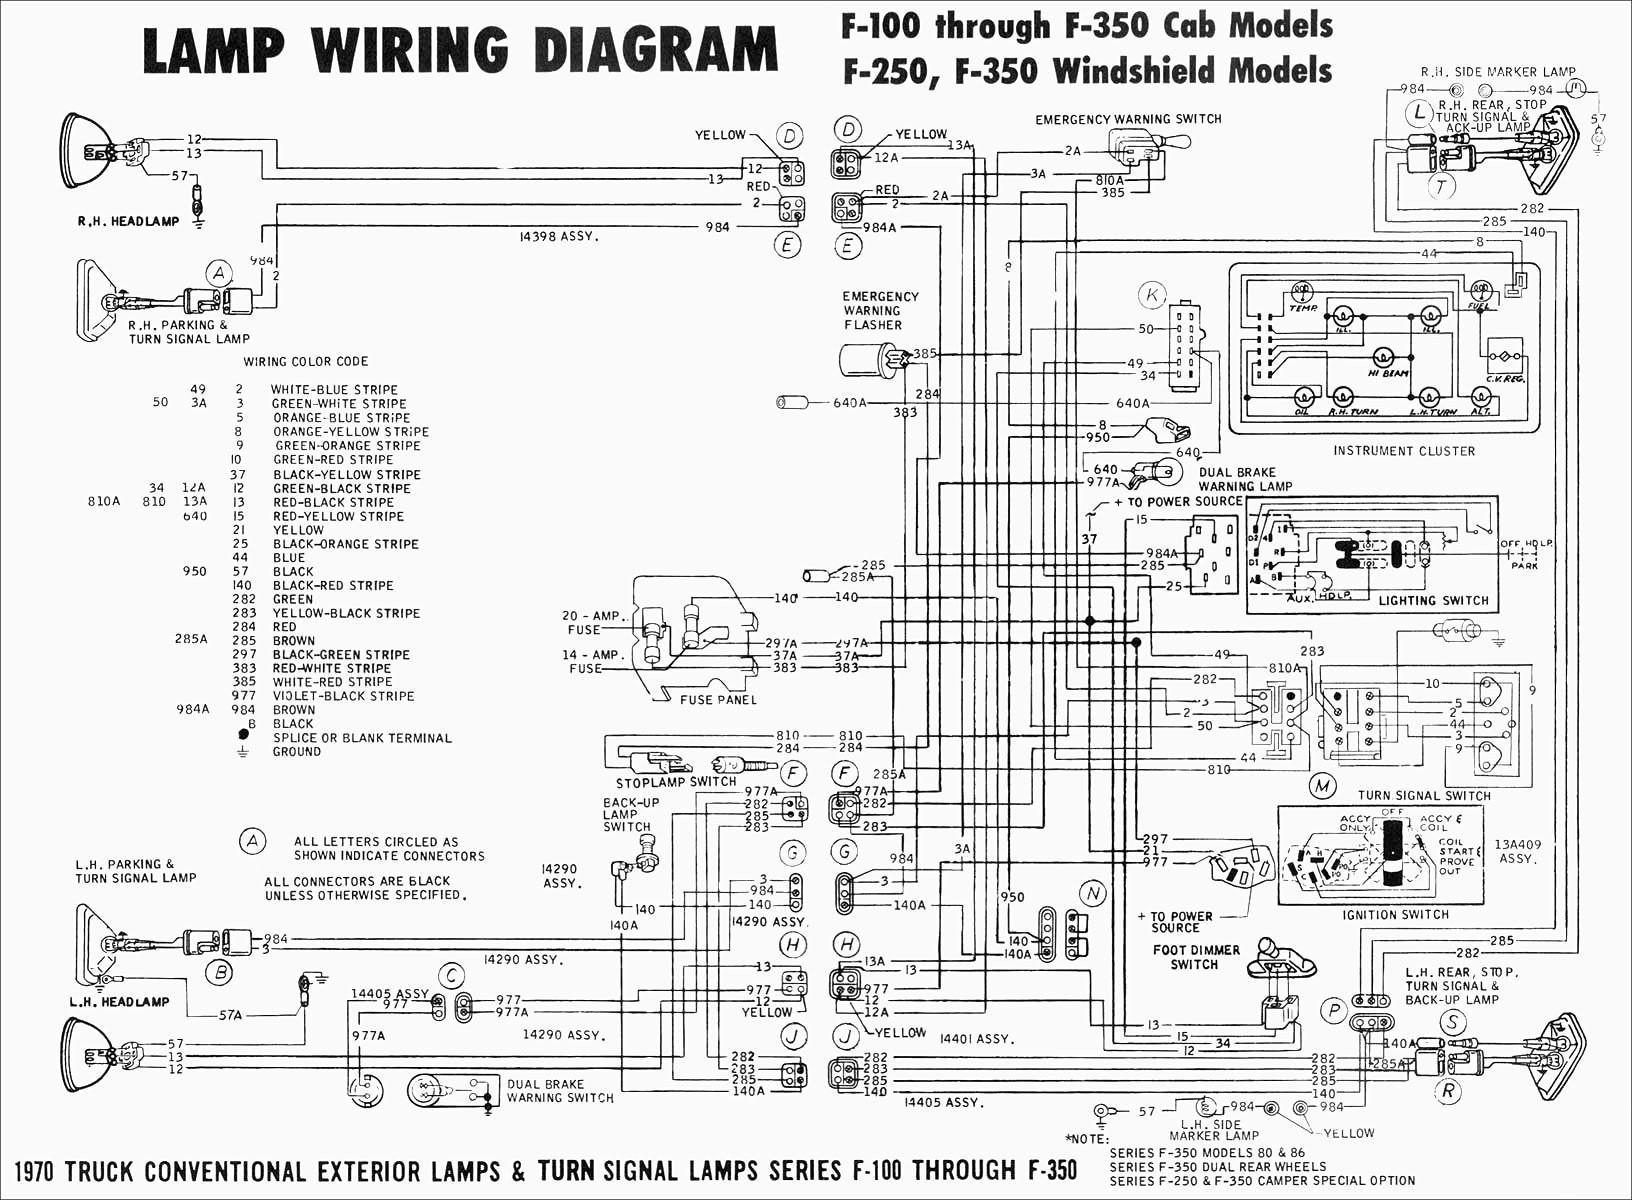 Amp Research Power Step Wiring Diagram Dcac93f Wire Diagram Allis Chalmers B12 Of Amp Research Power Step Wiring Diagram F099f Range Rover Denso Radio Wiring Schematics 2007